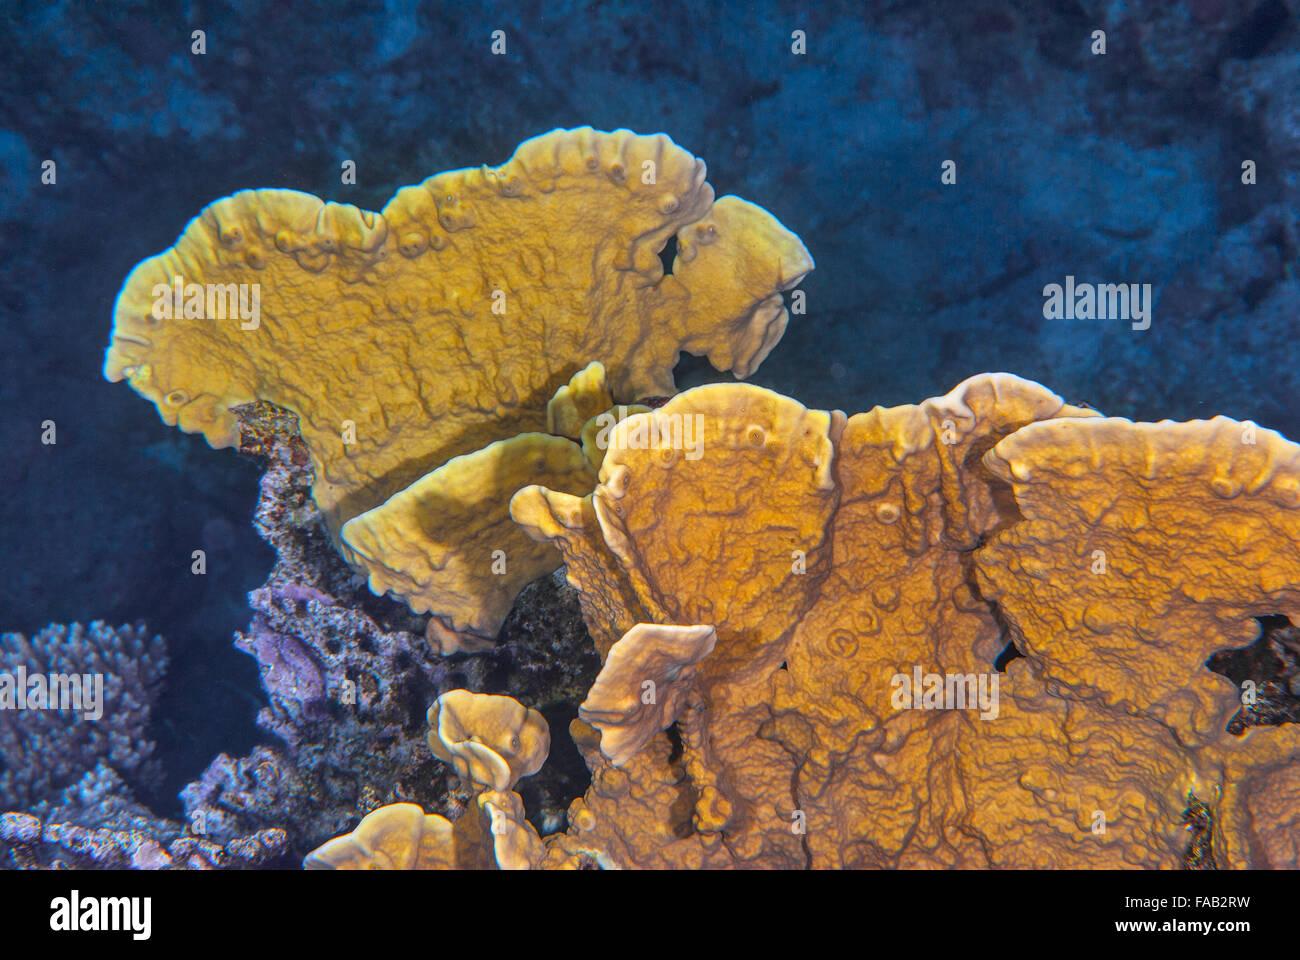 Fire coral, Millepora platyphylla, Milleporidae, Sharm el Sheikh, Red Sea, Egypt - Stock Image